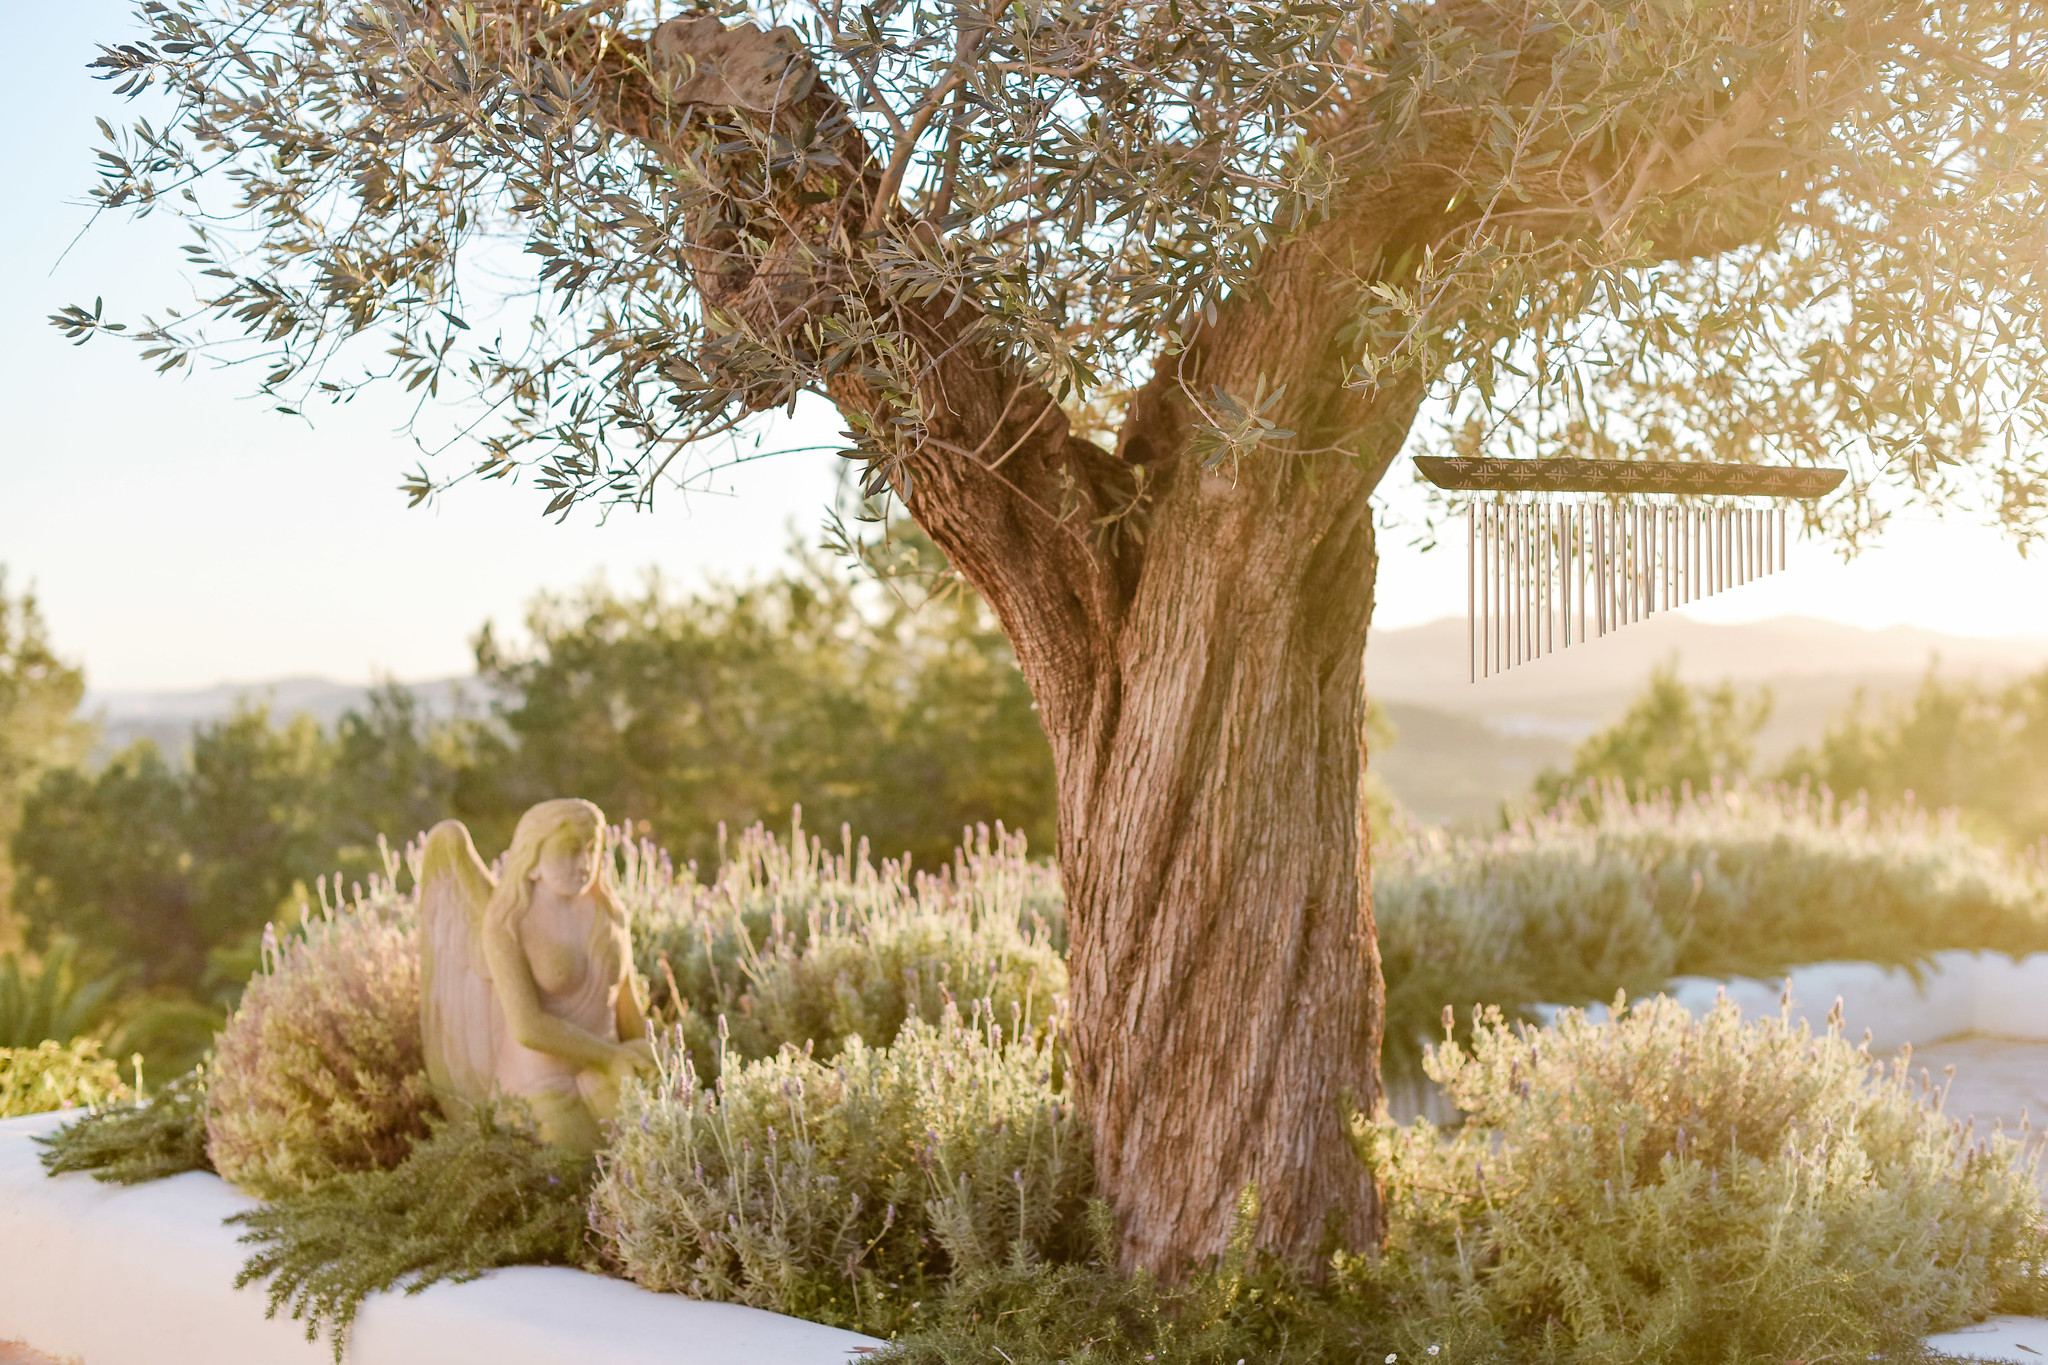 https://www.white-ibiza.com/wp-content/uploads/2020/05/white-ibiza-villas-can-lavanda-evening.jpg